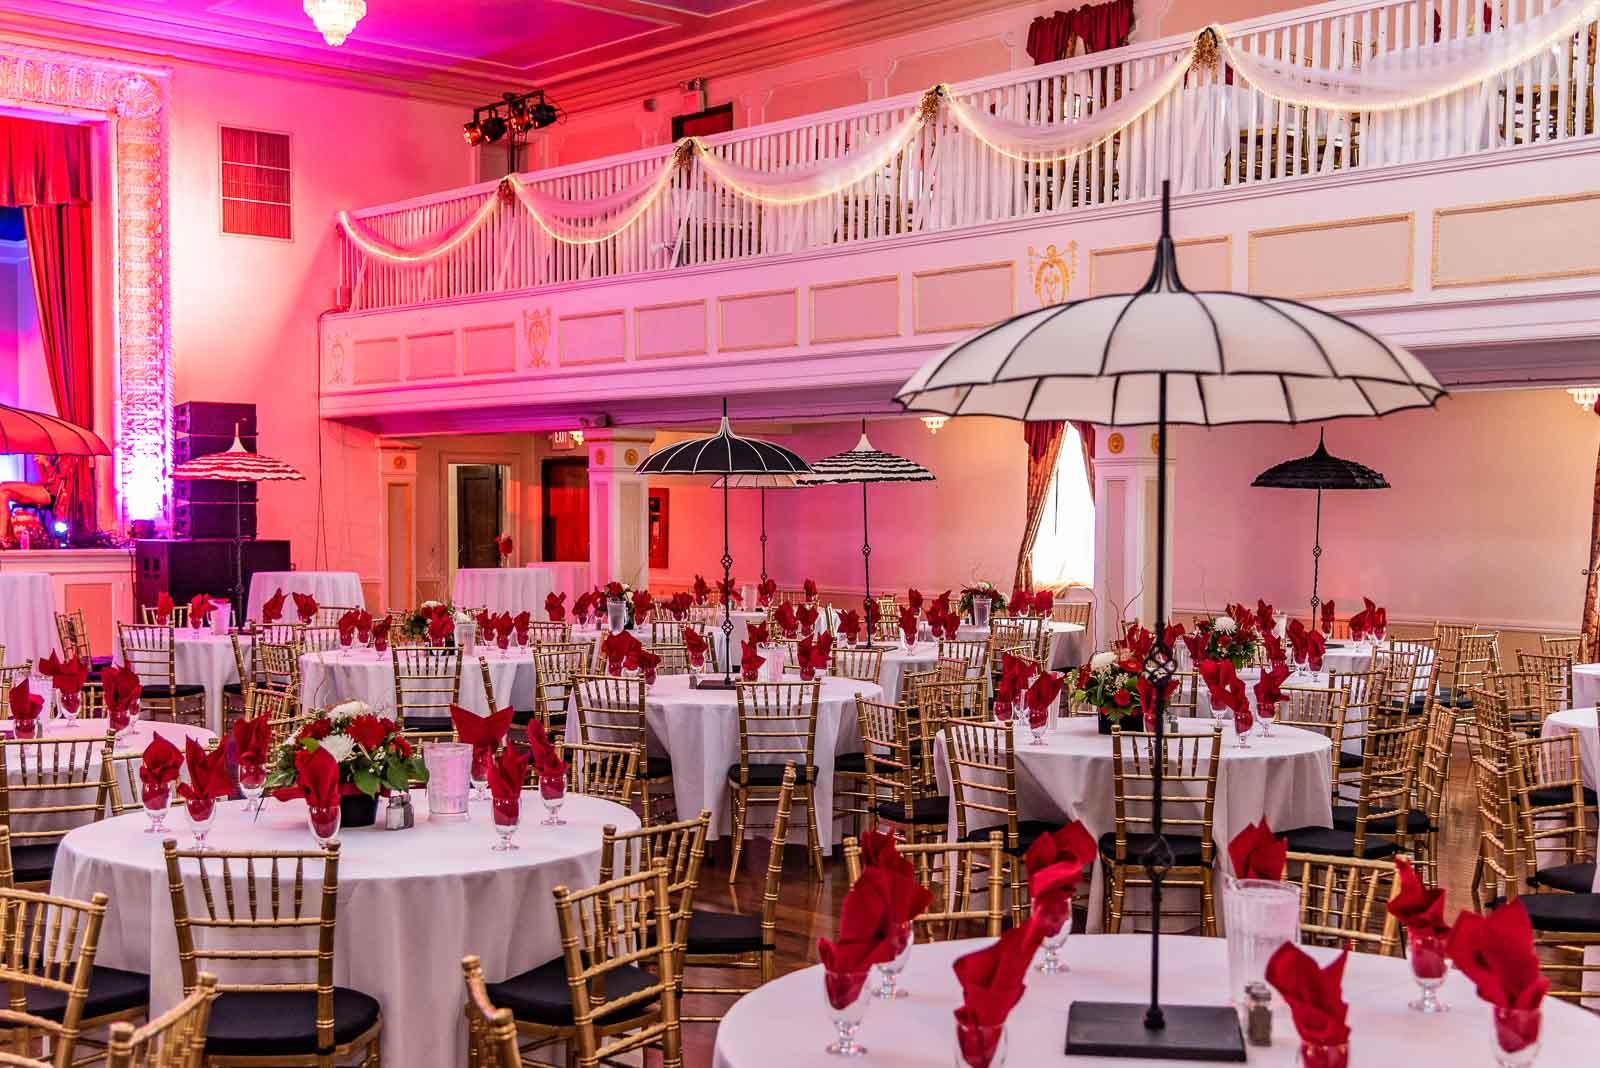 Corporate Event pictures from the Lafayette Grande | Lafayette Grande